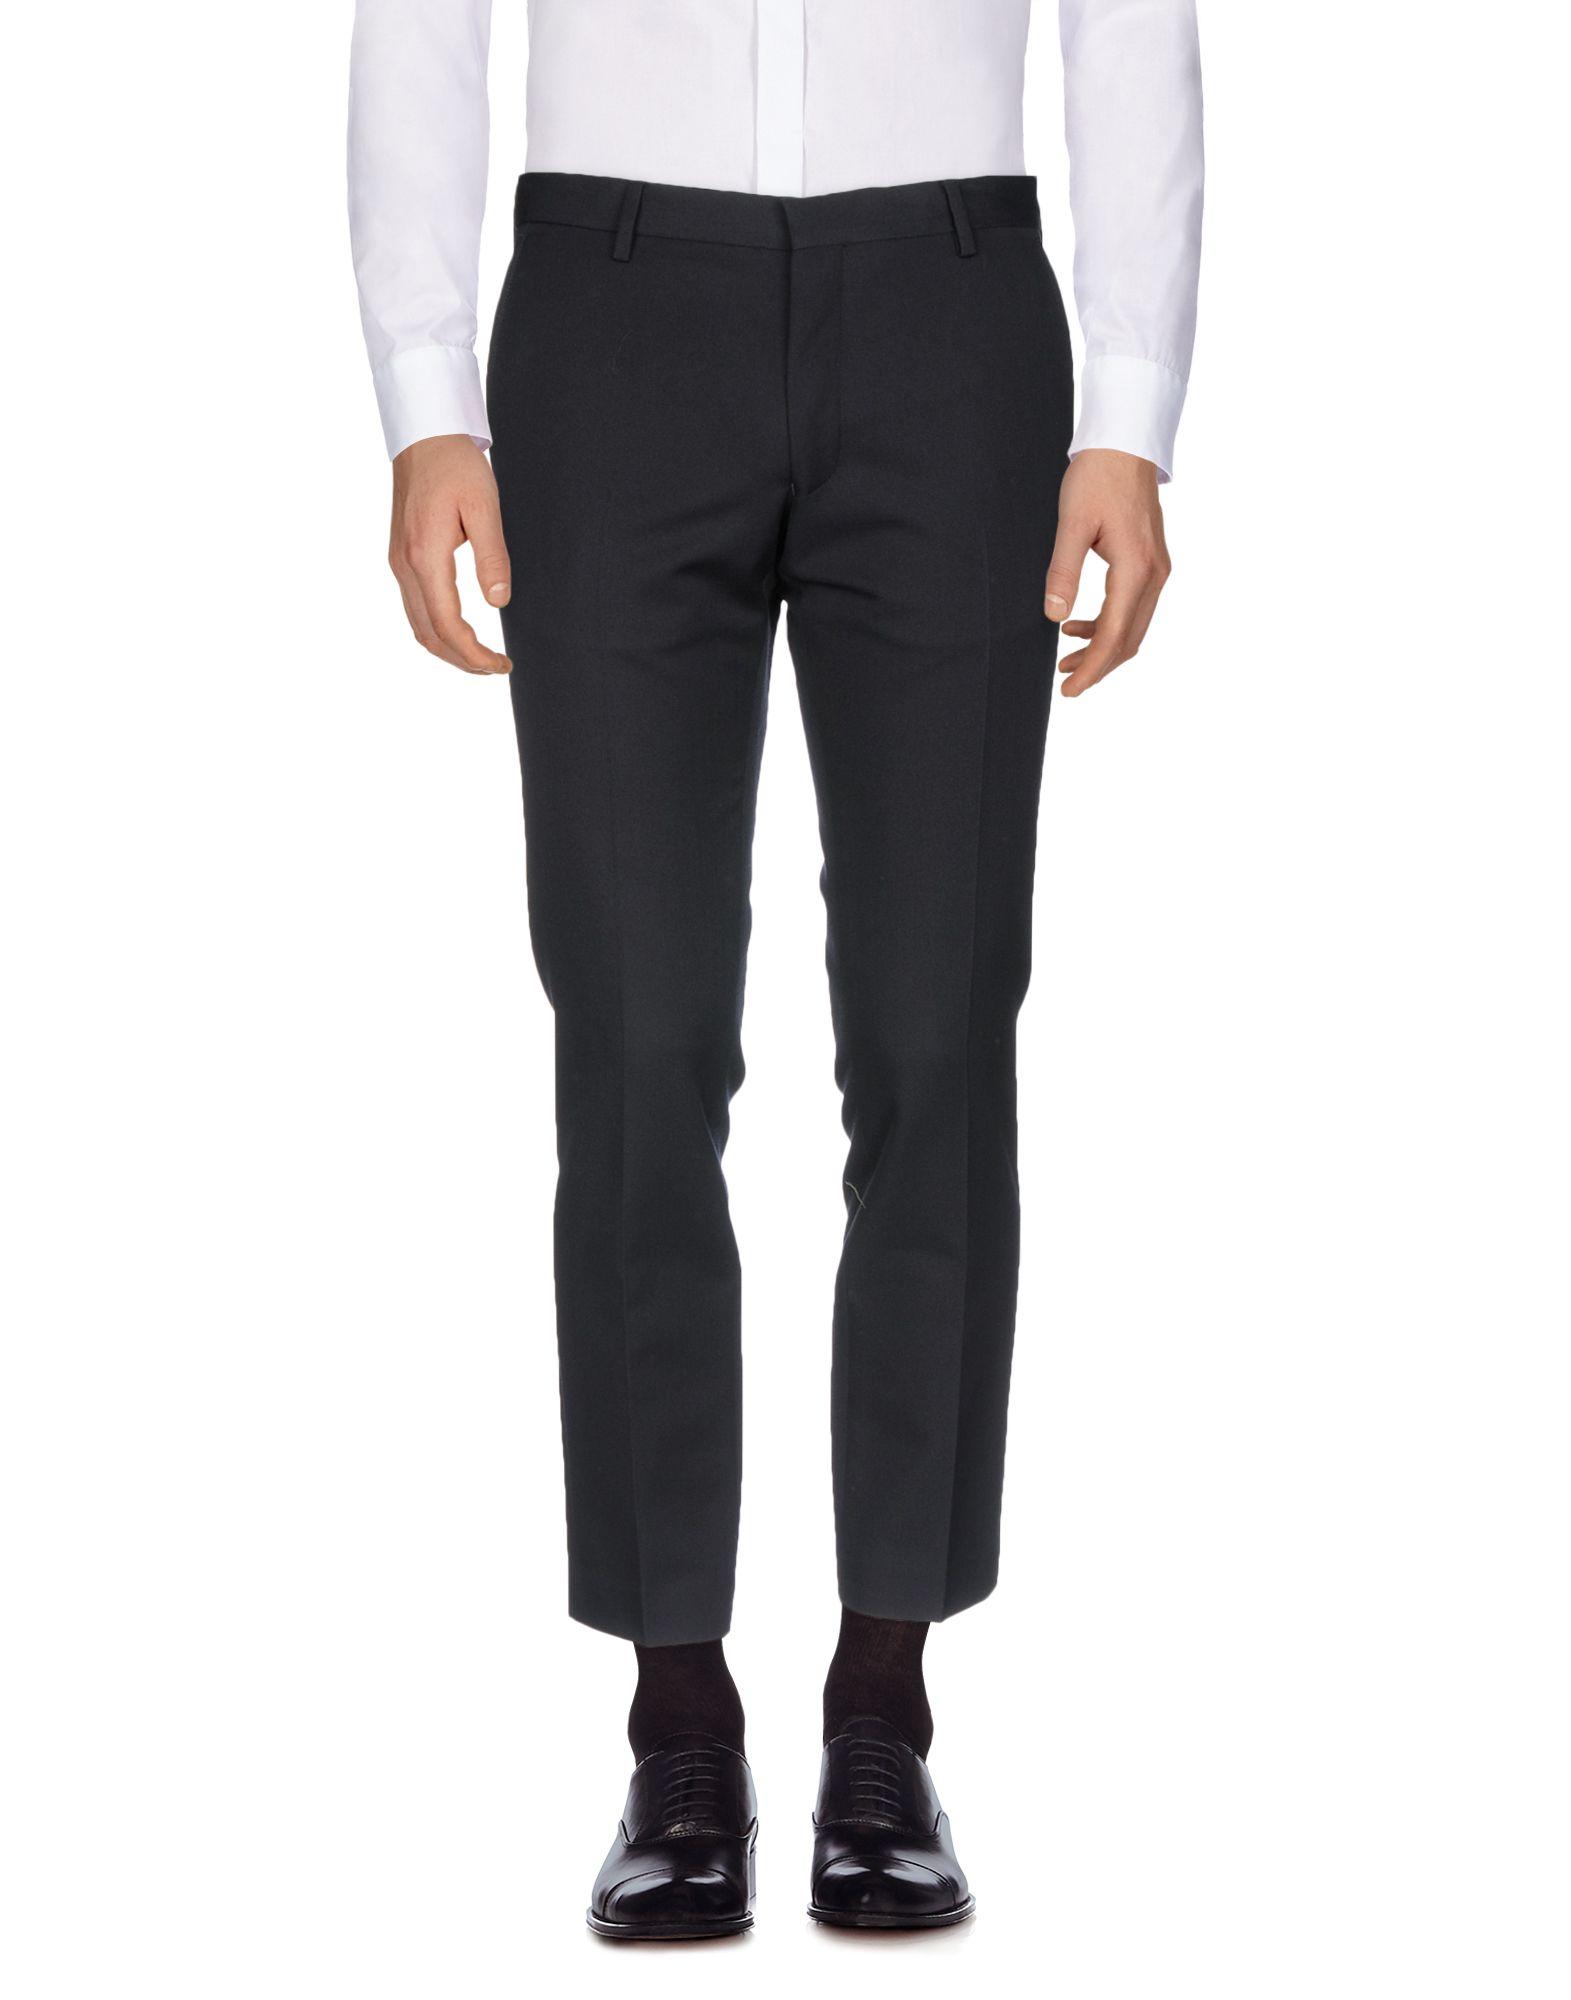 Pantalone Pantalone Pantalone Dries Van Noten Uomo - 13186737VN 8a35cf